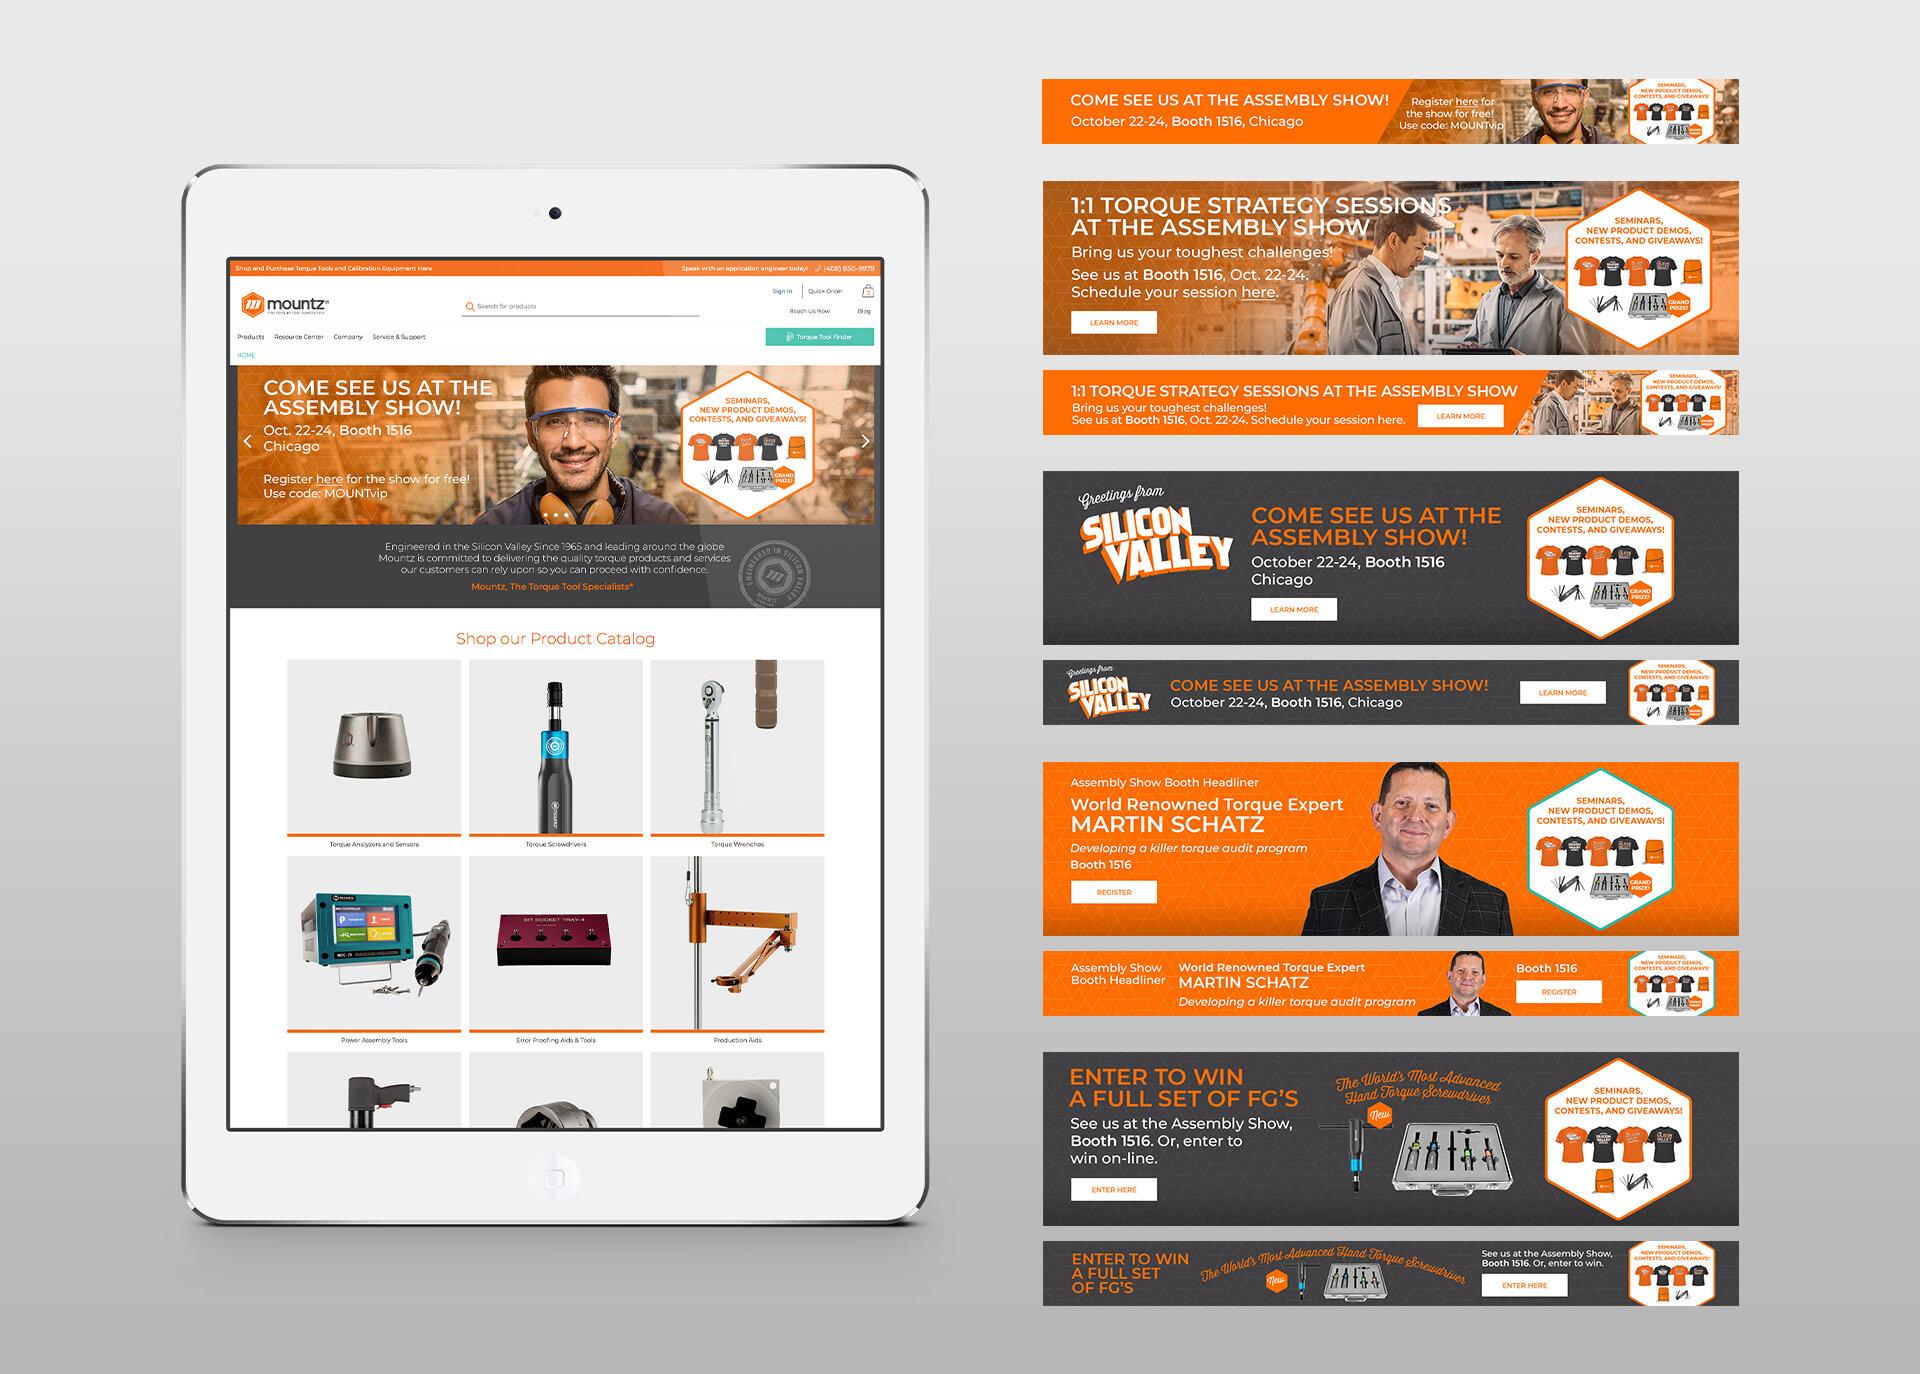 ASE_Web-Banners-v1.jpg